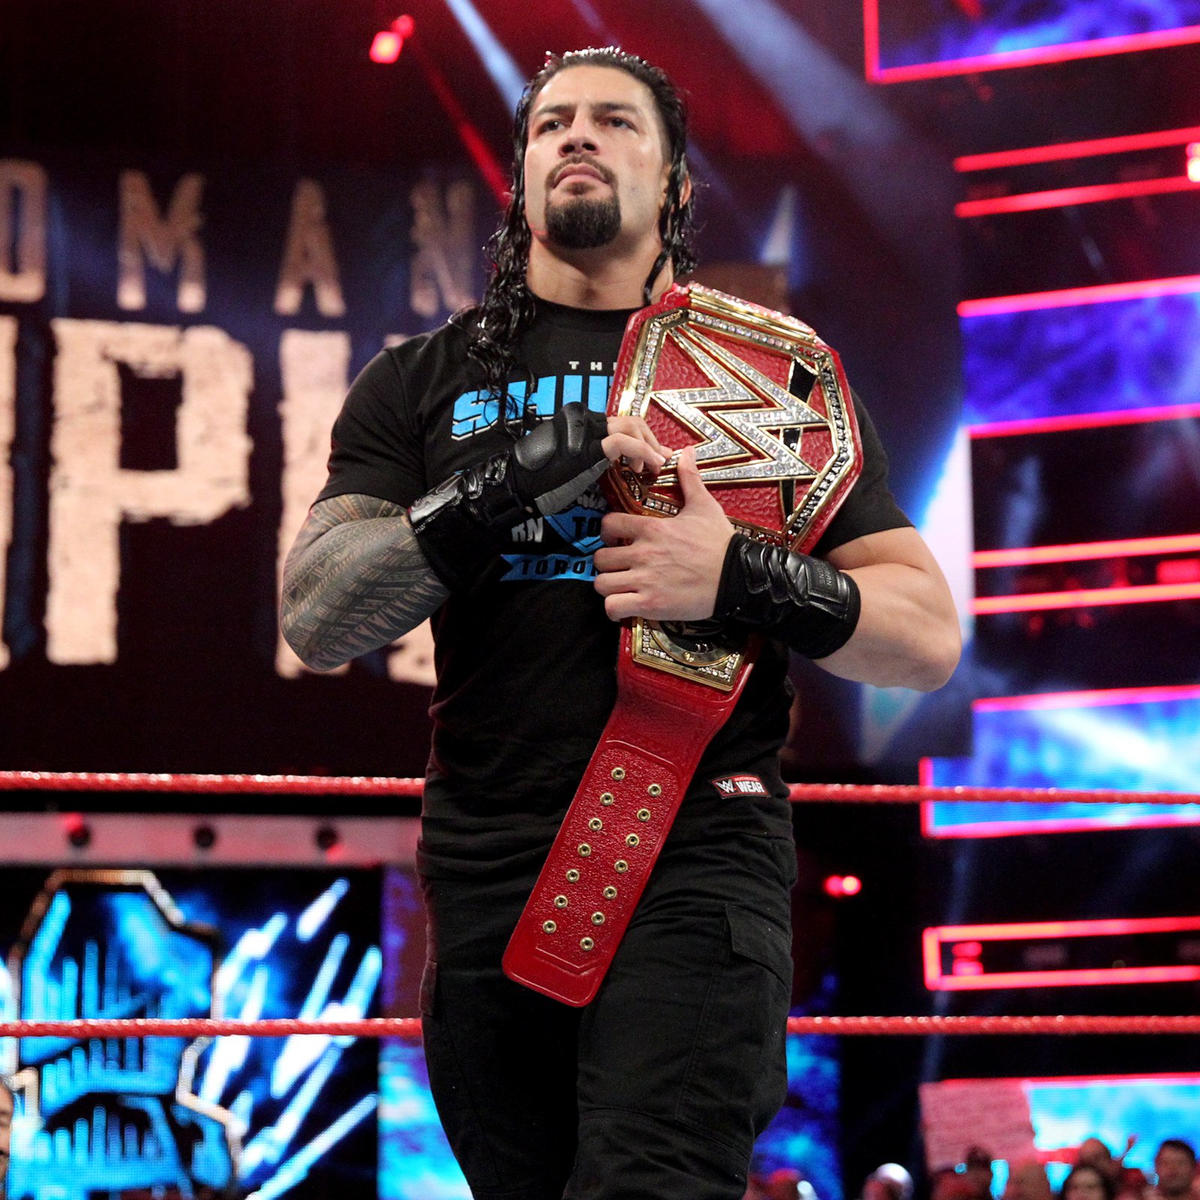 Universal Champion Roman Reigns Kicks Off Monday Night Raw In Toronto